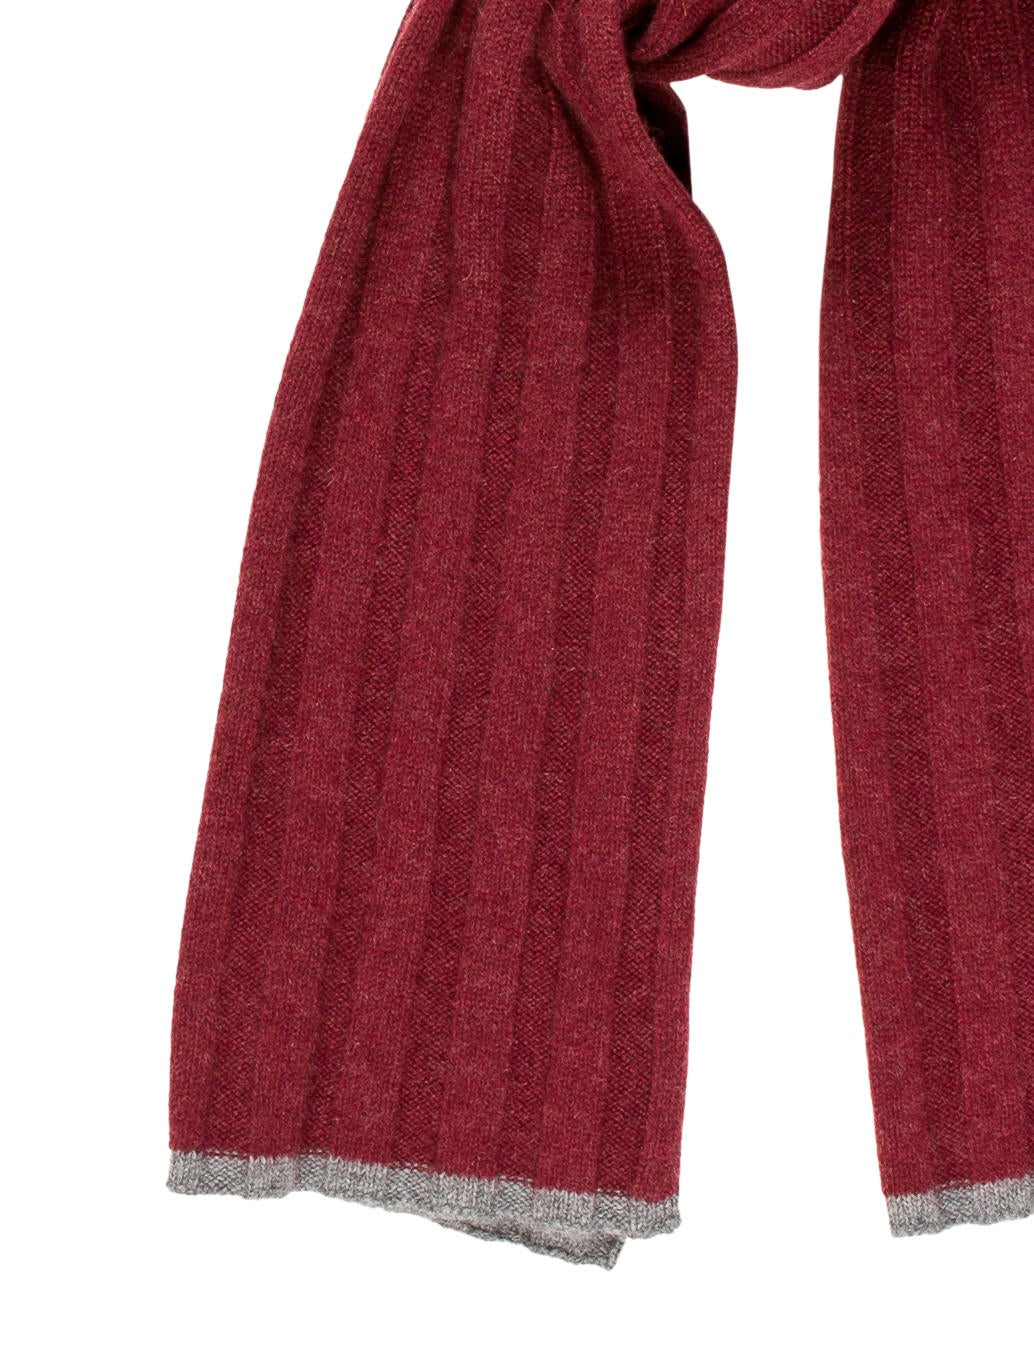 Brunello Cucinelli Cashmere Rib-Knit Scarf - Accessories - BRU42970 The Rea...